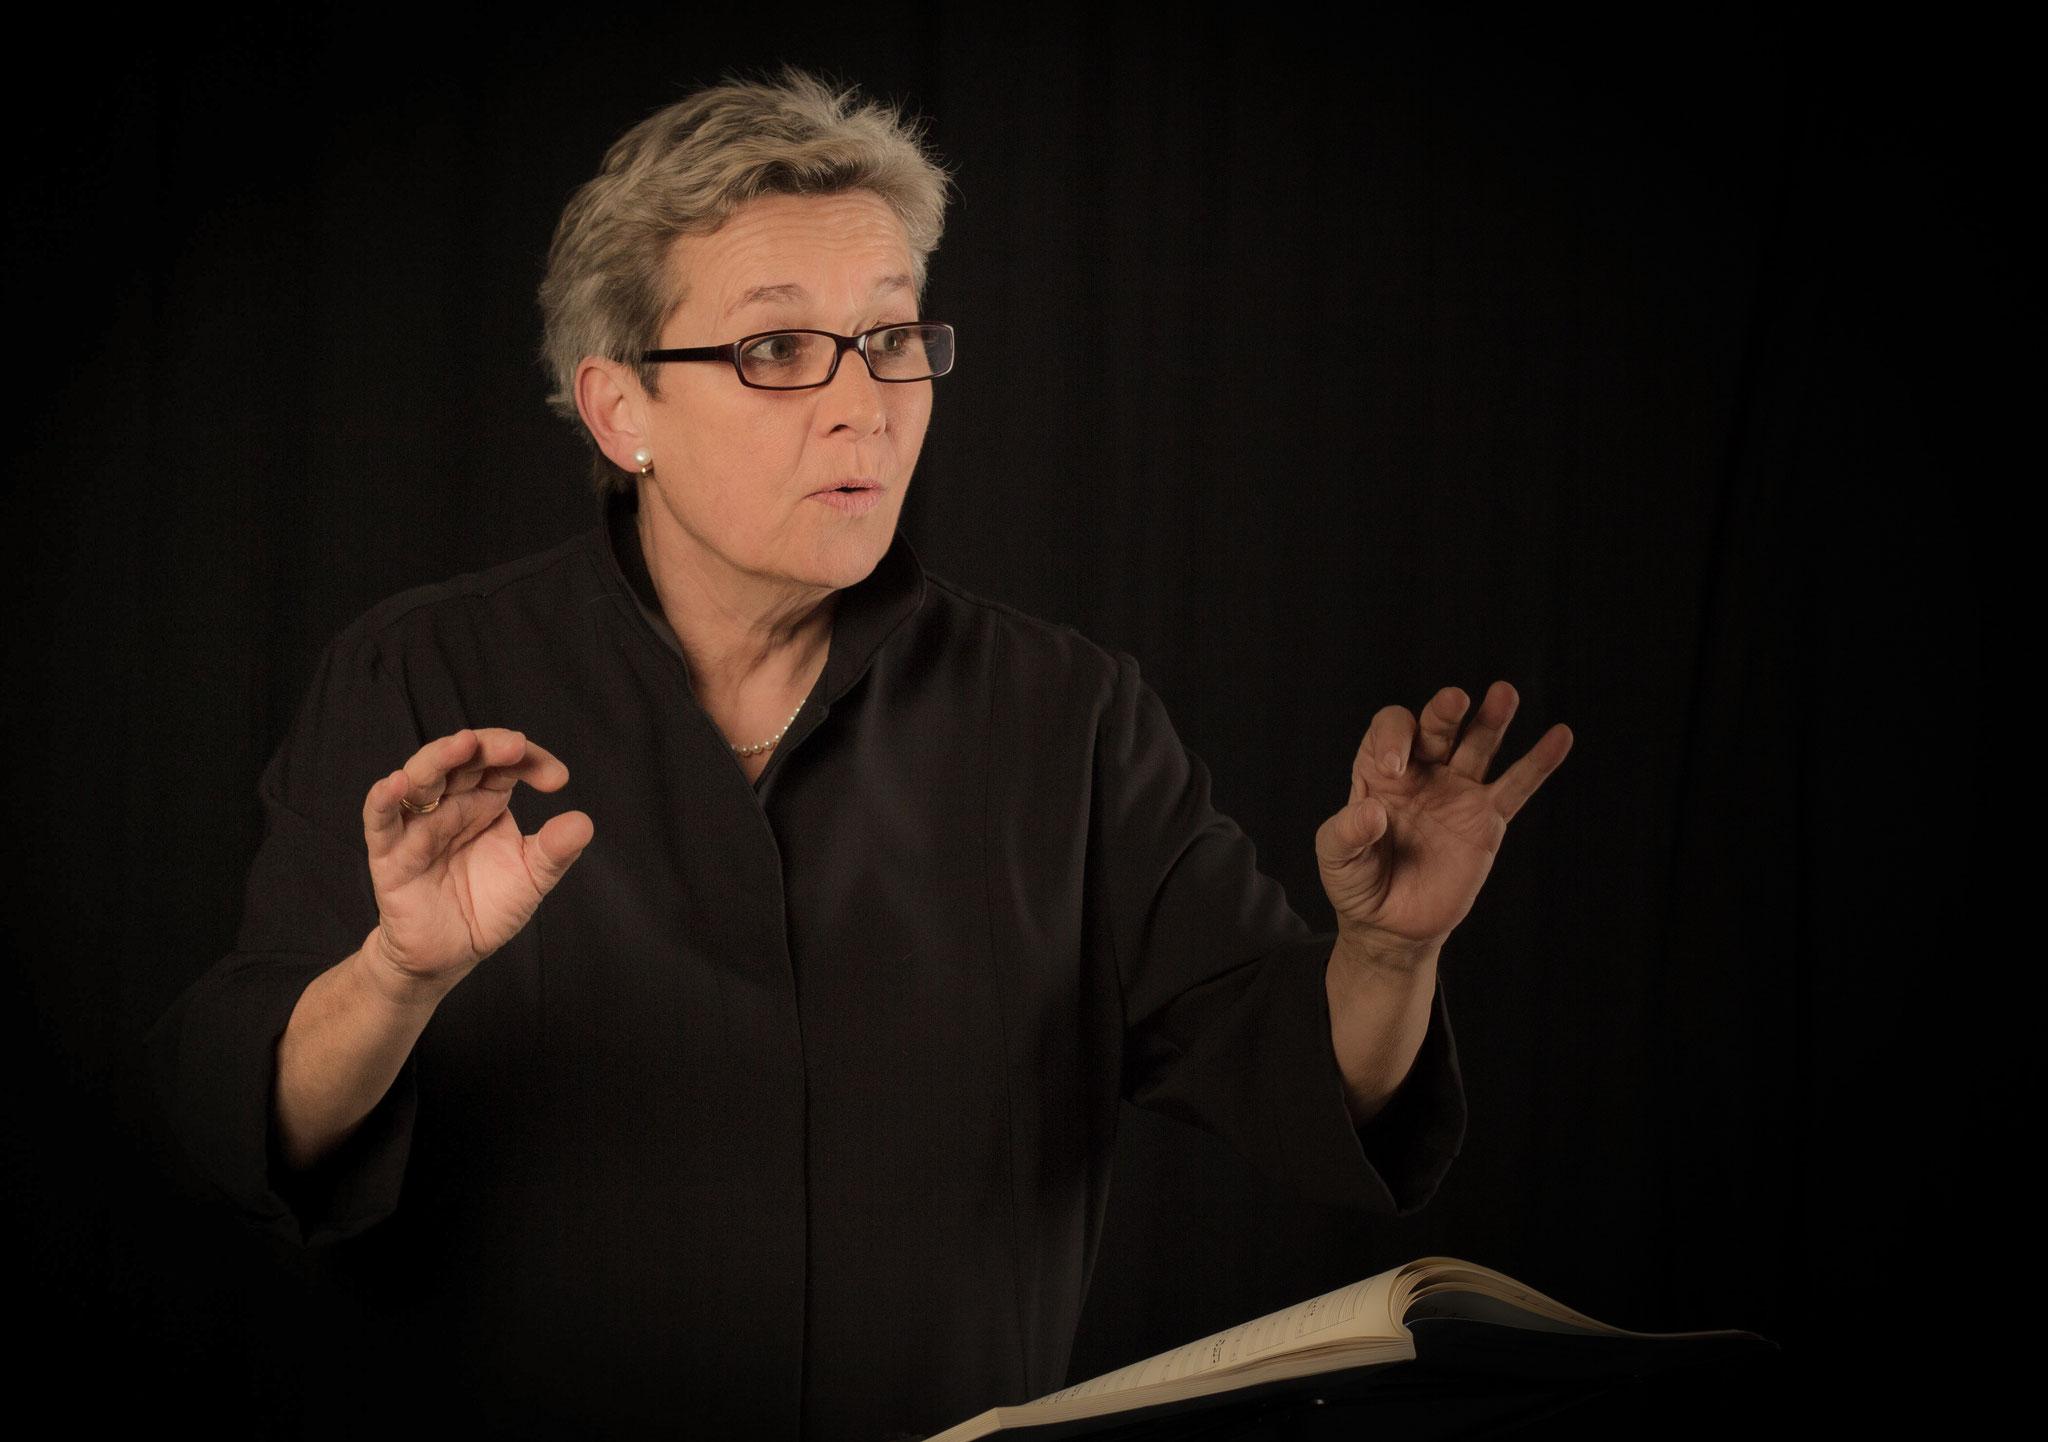 Michi GAIGG, conductor